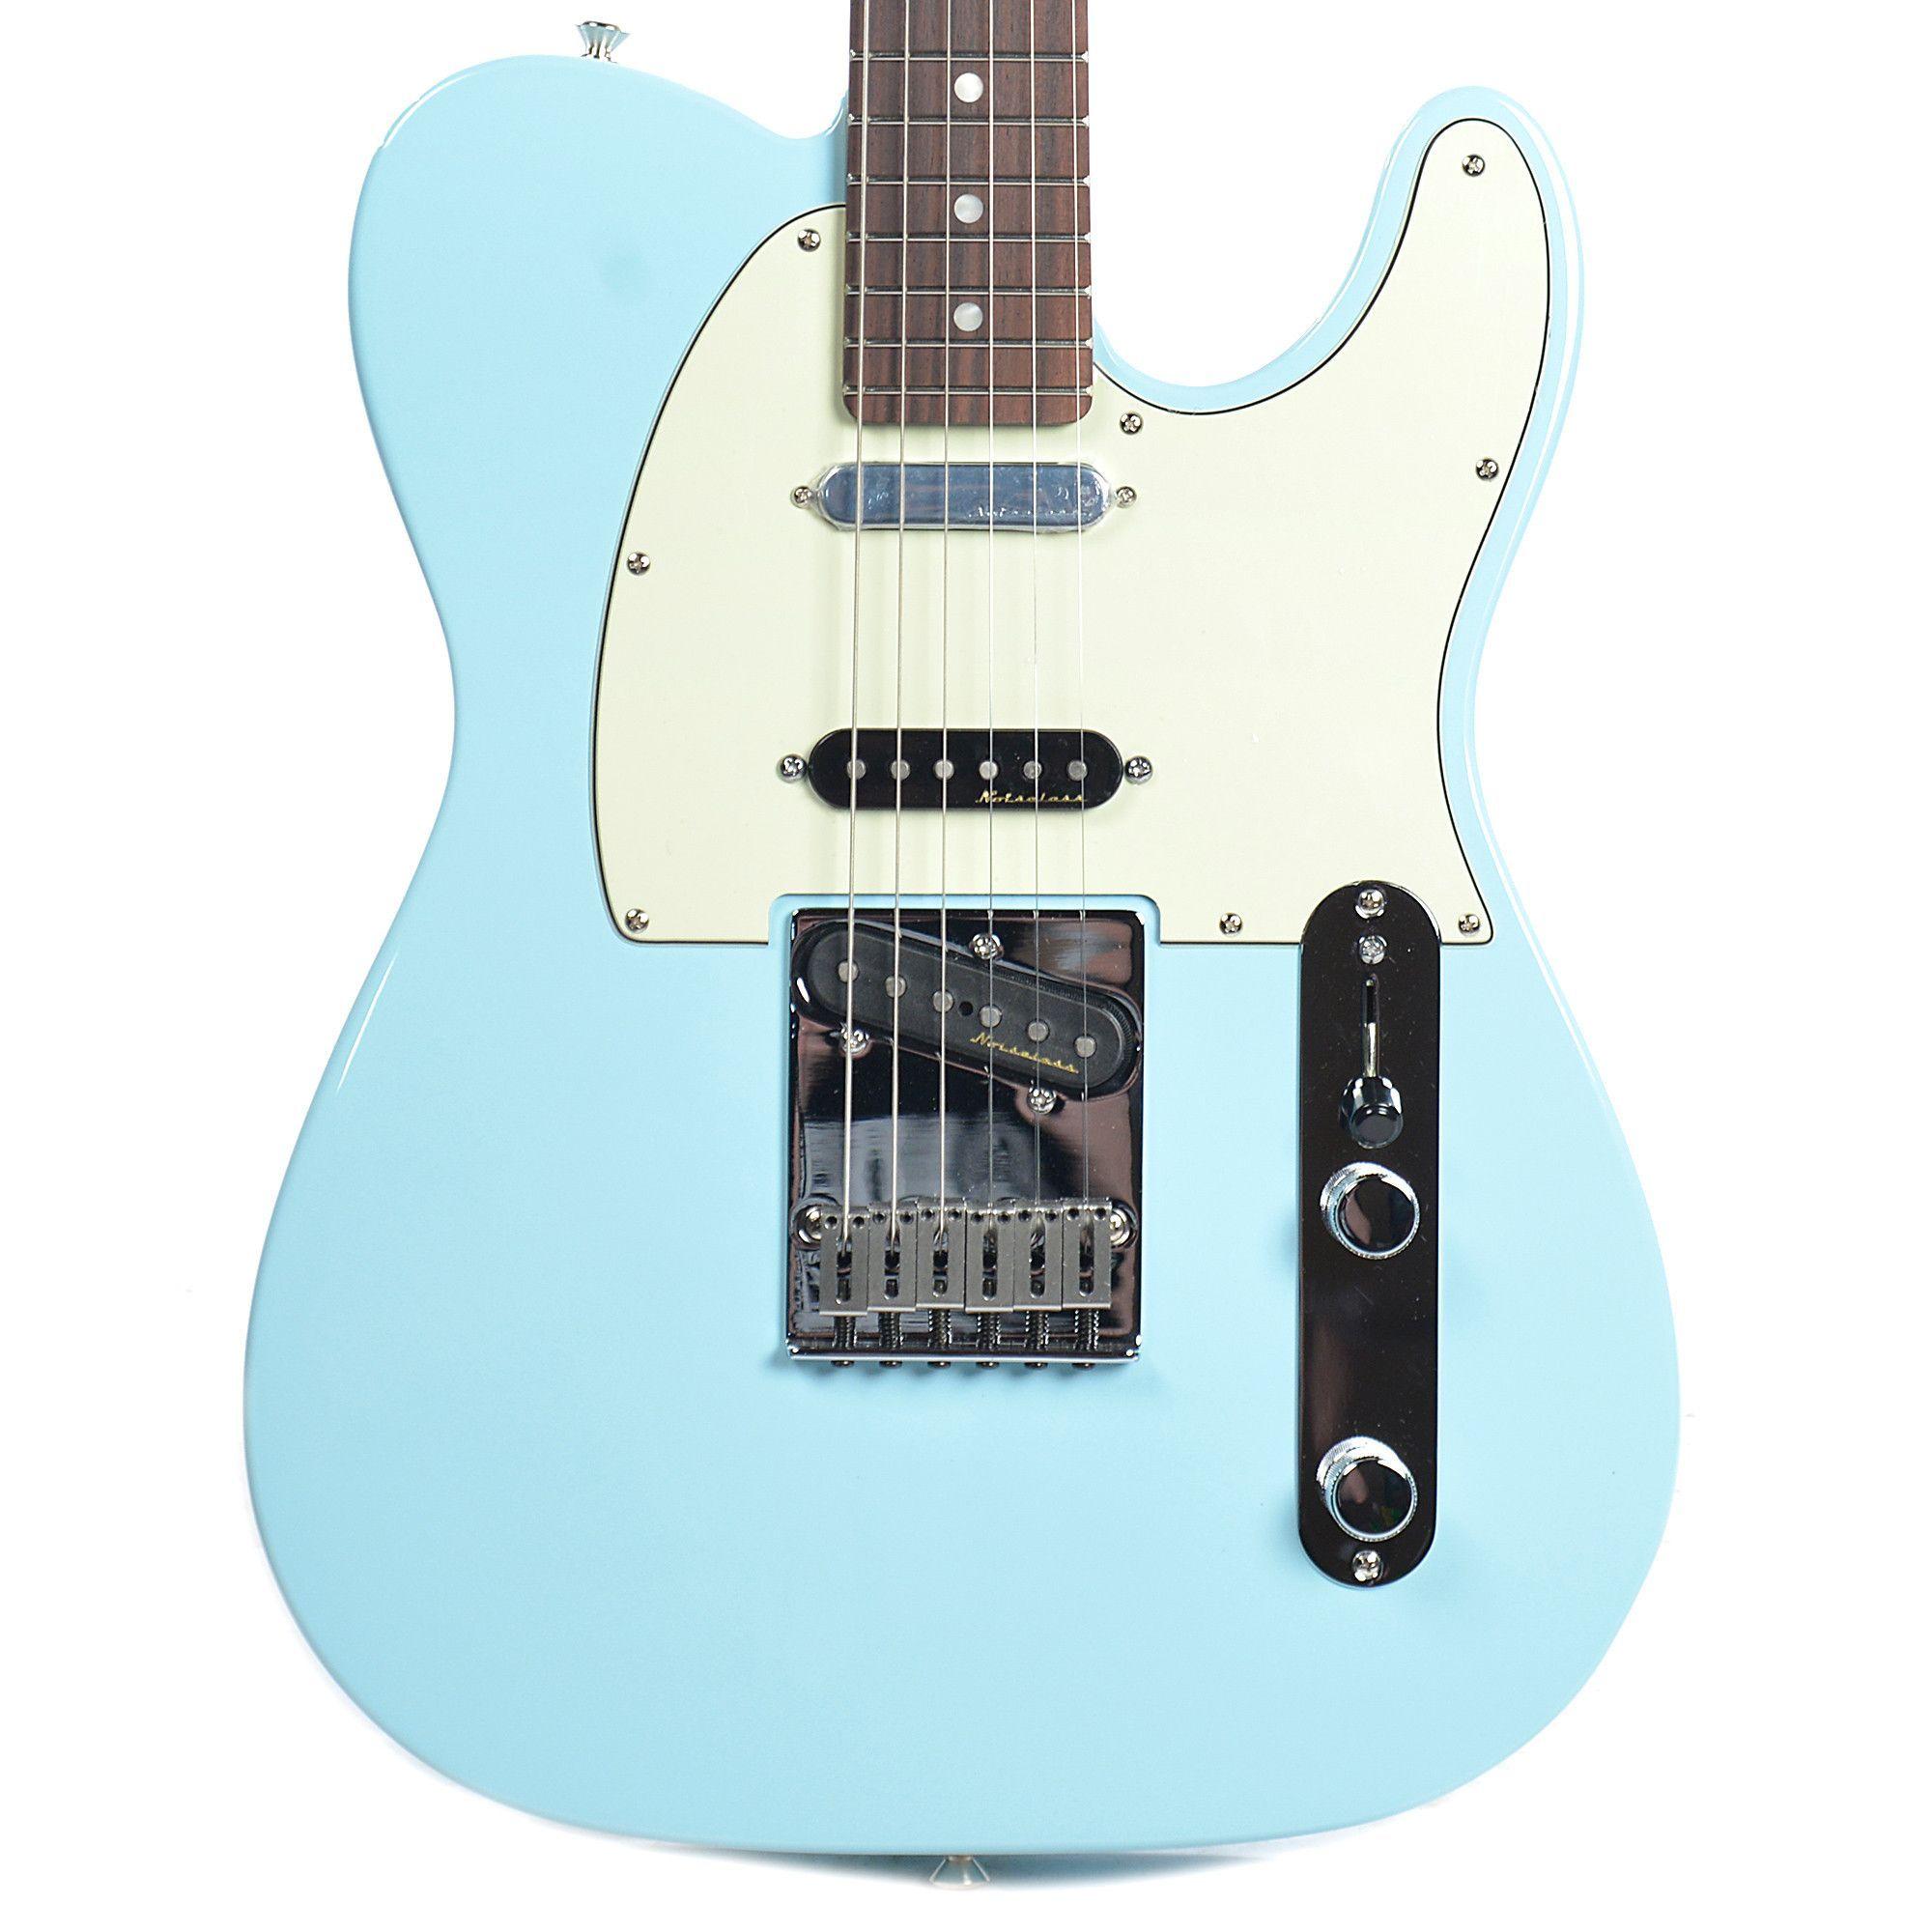 Fender Deluxe Nashville Telecaster Daphne Blue Fender Deluxe Telecaster Fender American Deluxe